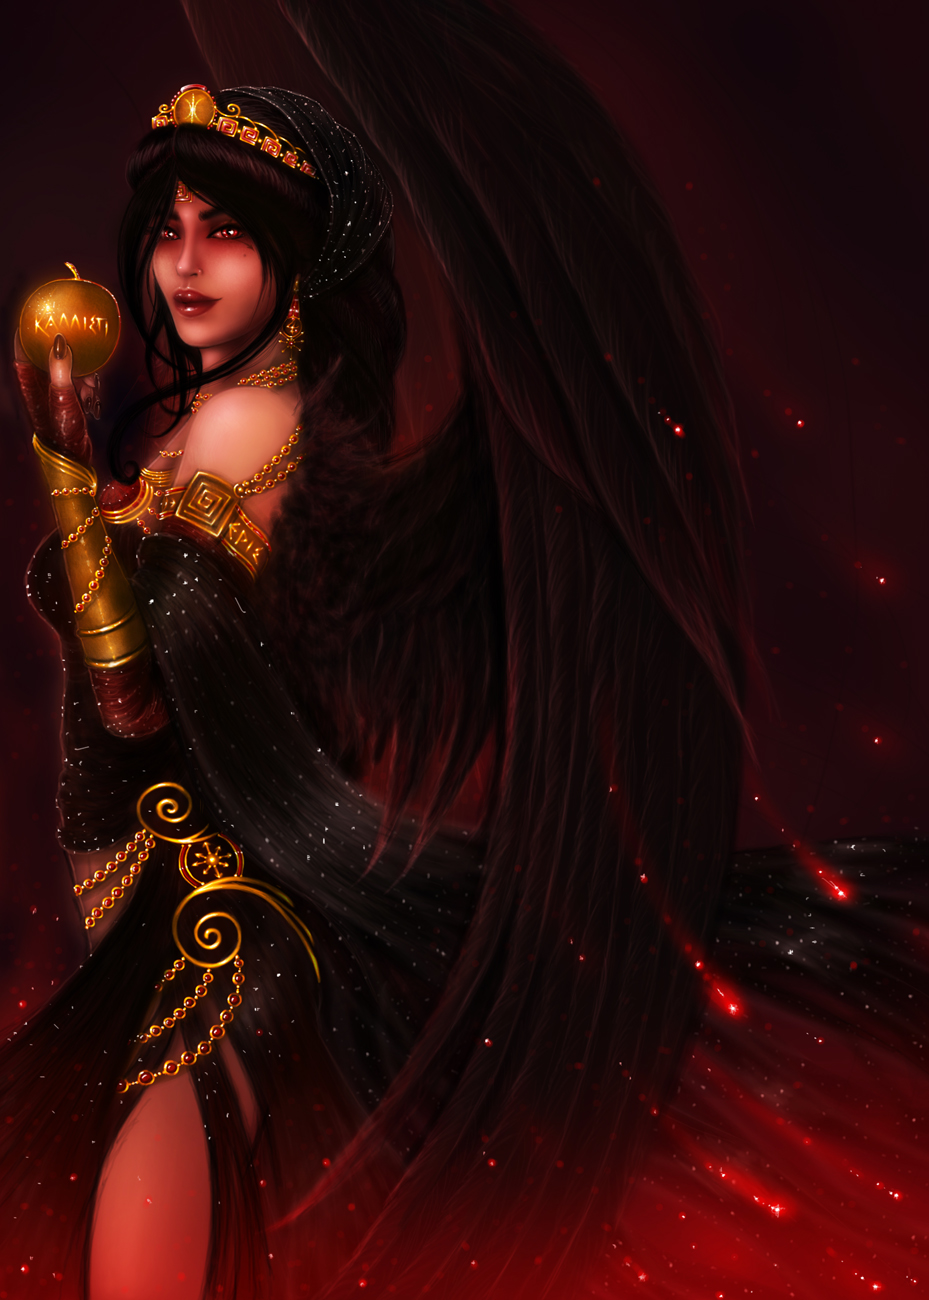 Hellenic Mythology - Eris, Goddess of Discord by EmanuellaKozas